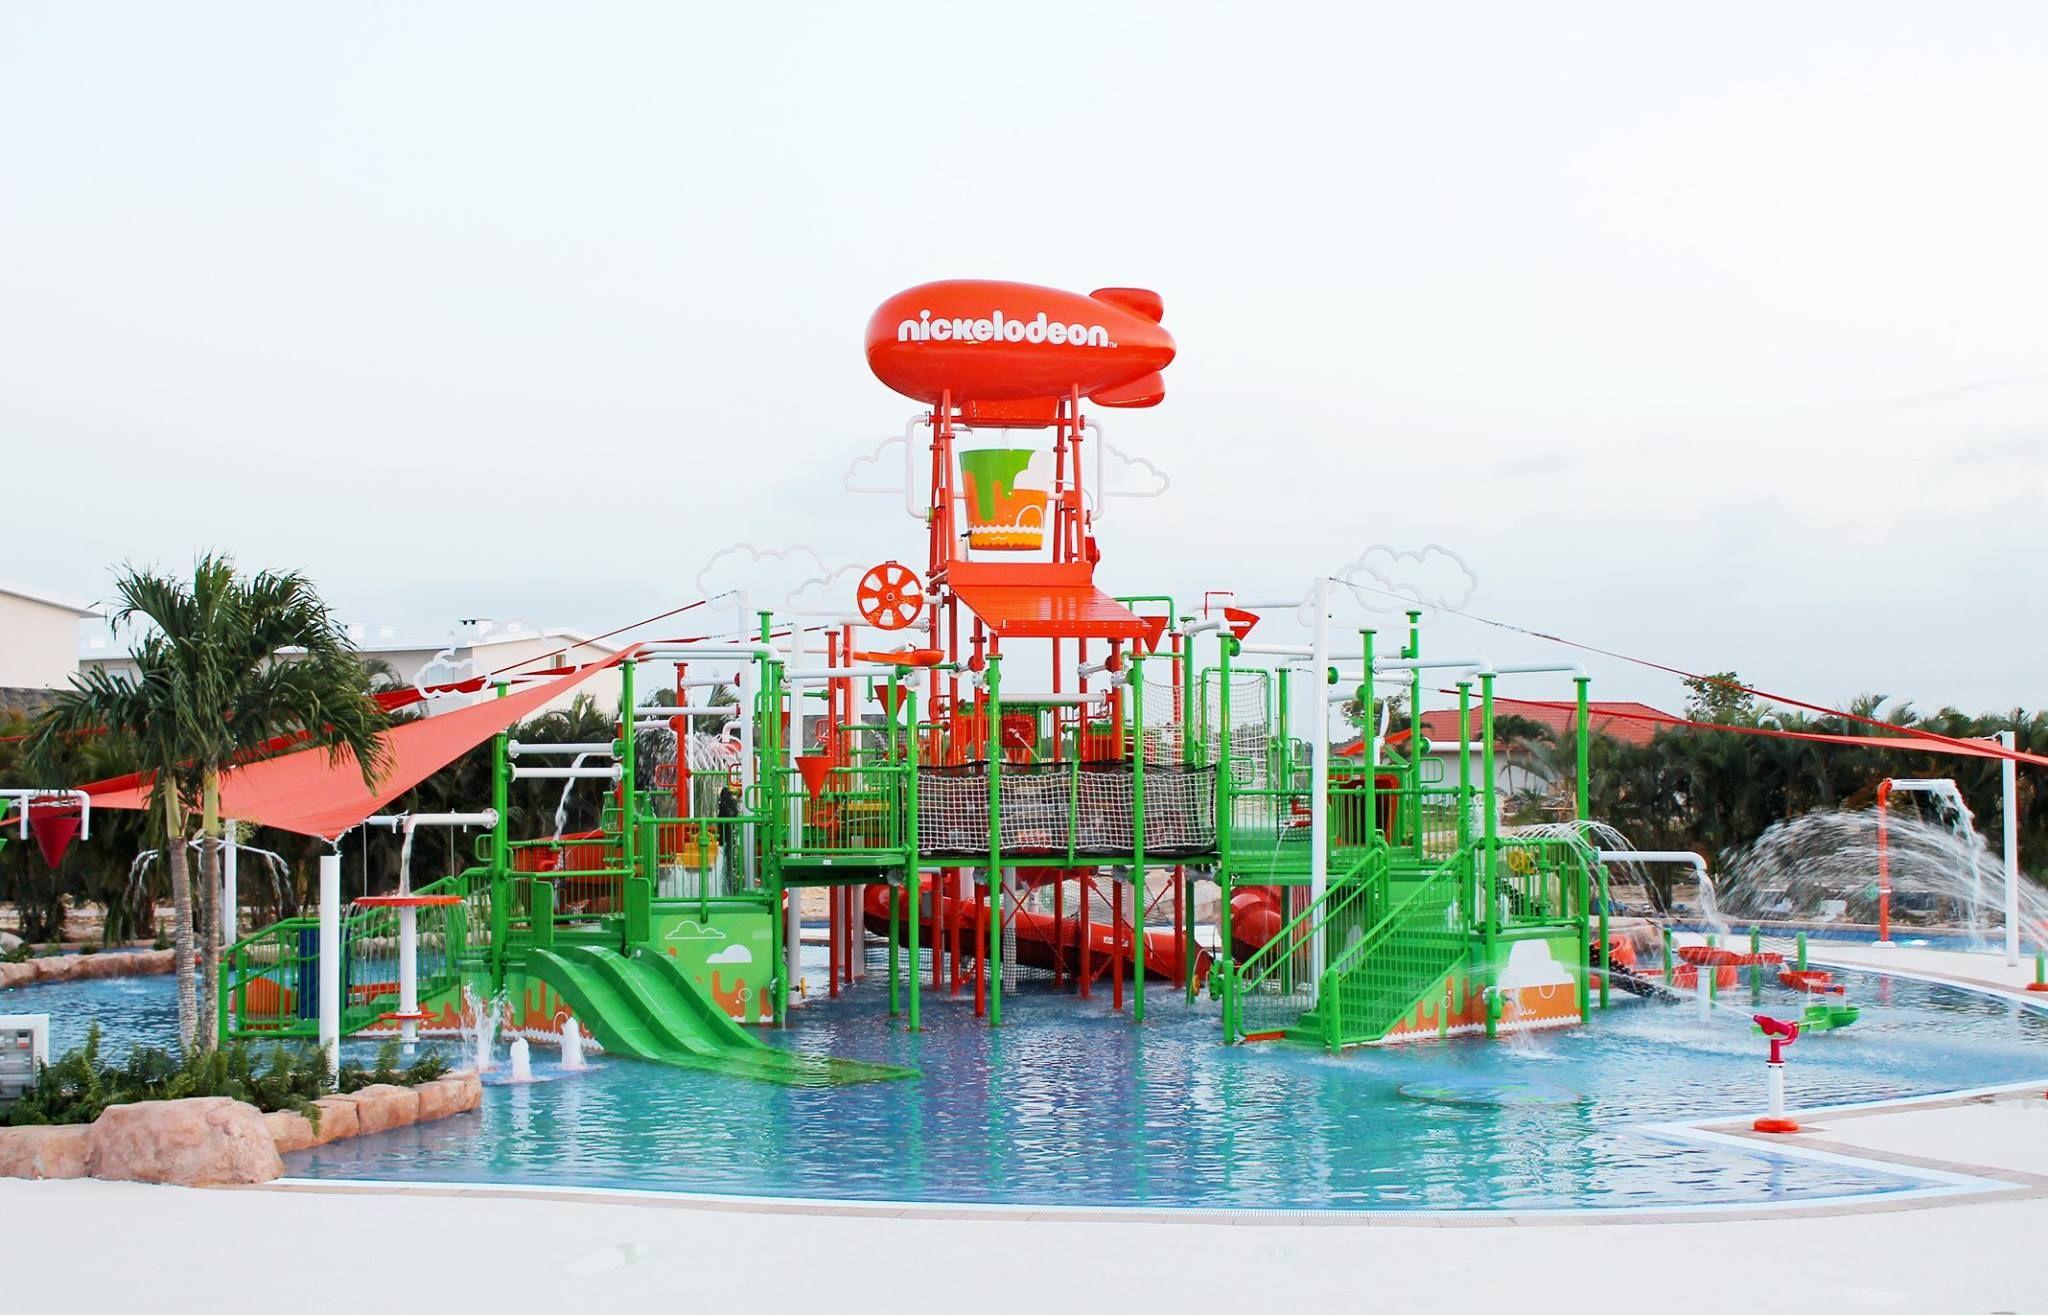 Nickelodeon-Punta-Cana 5